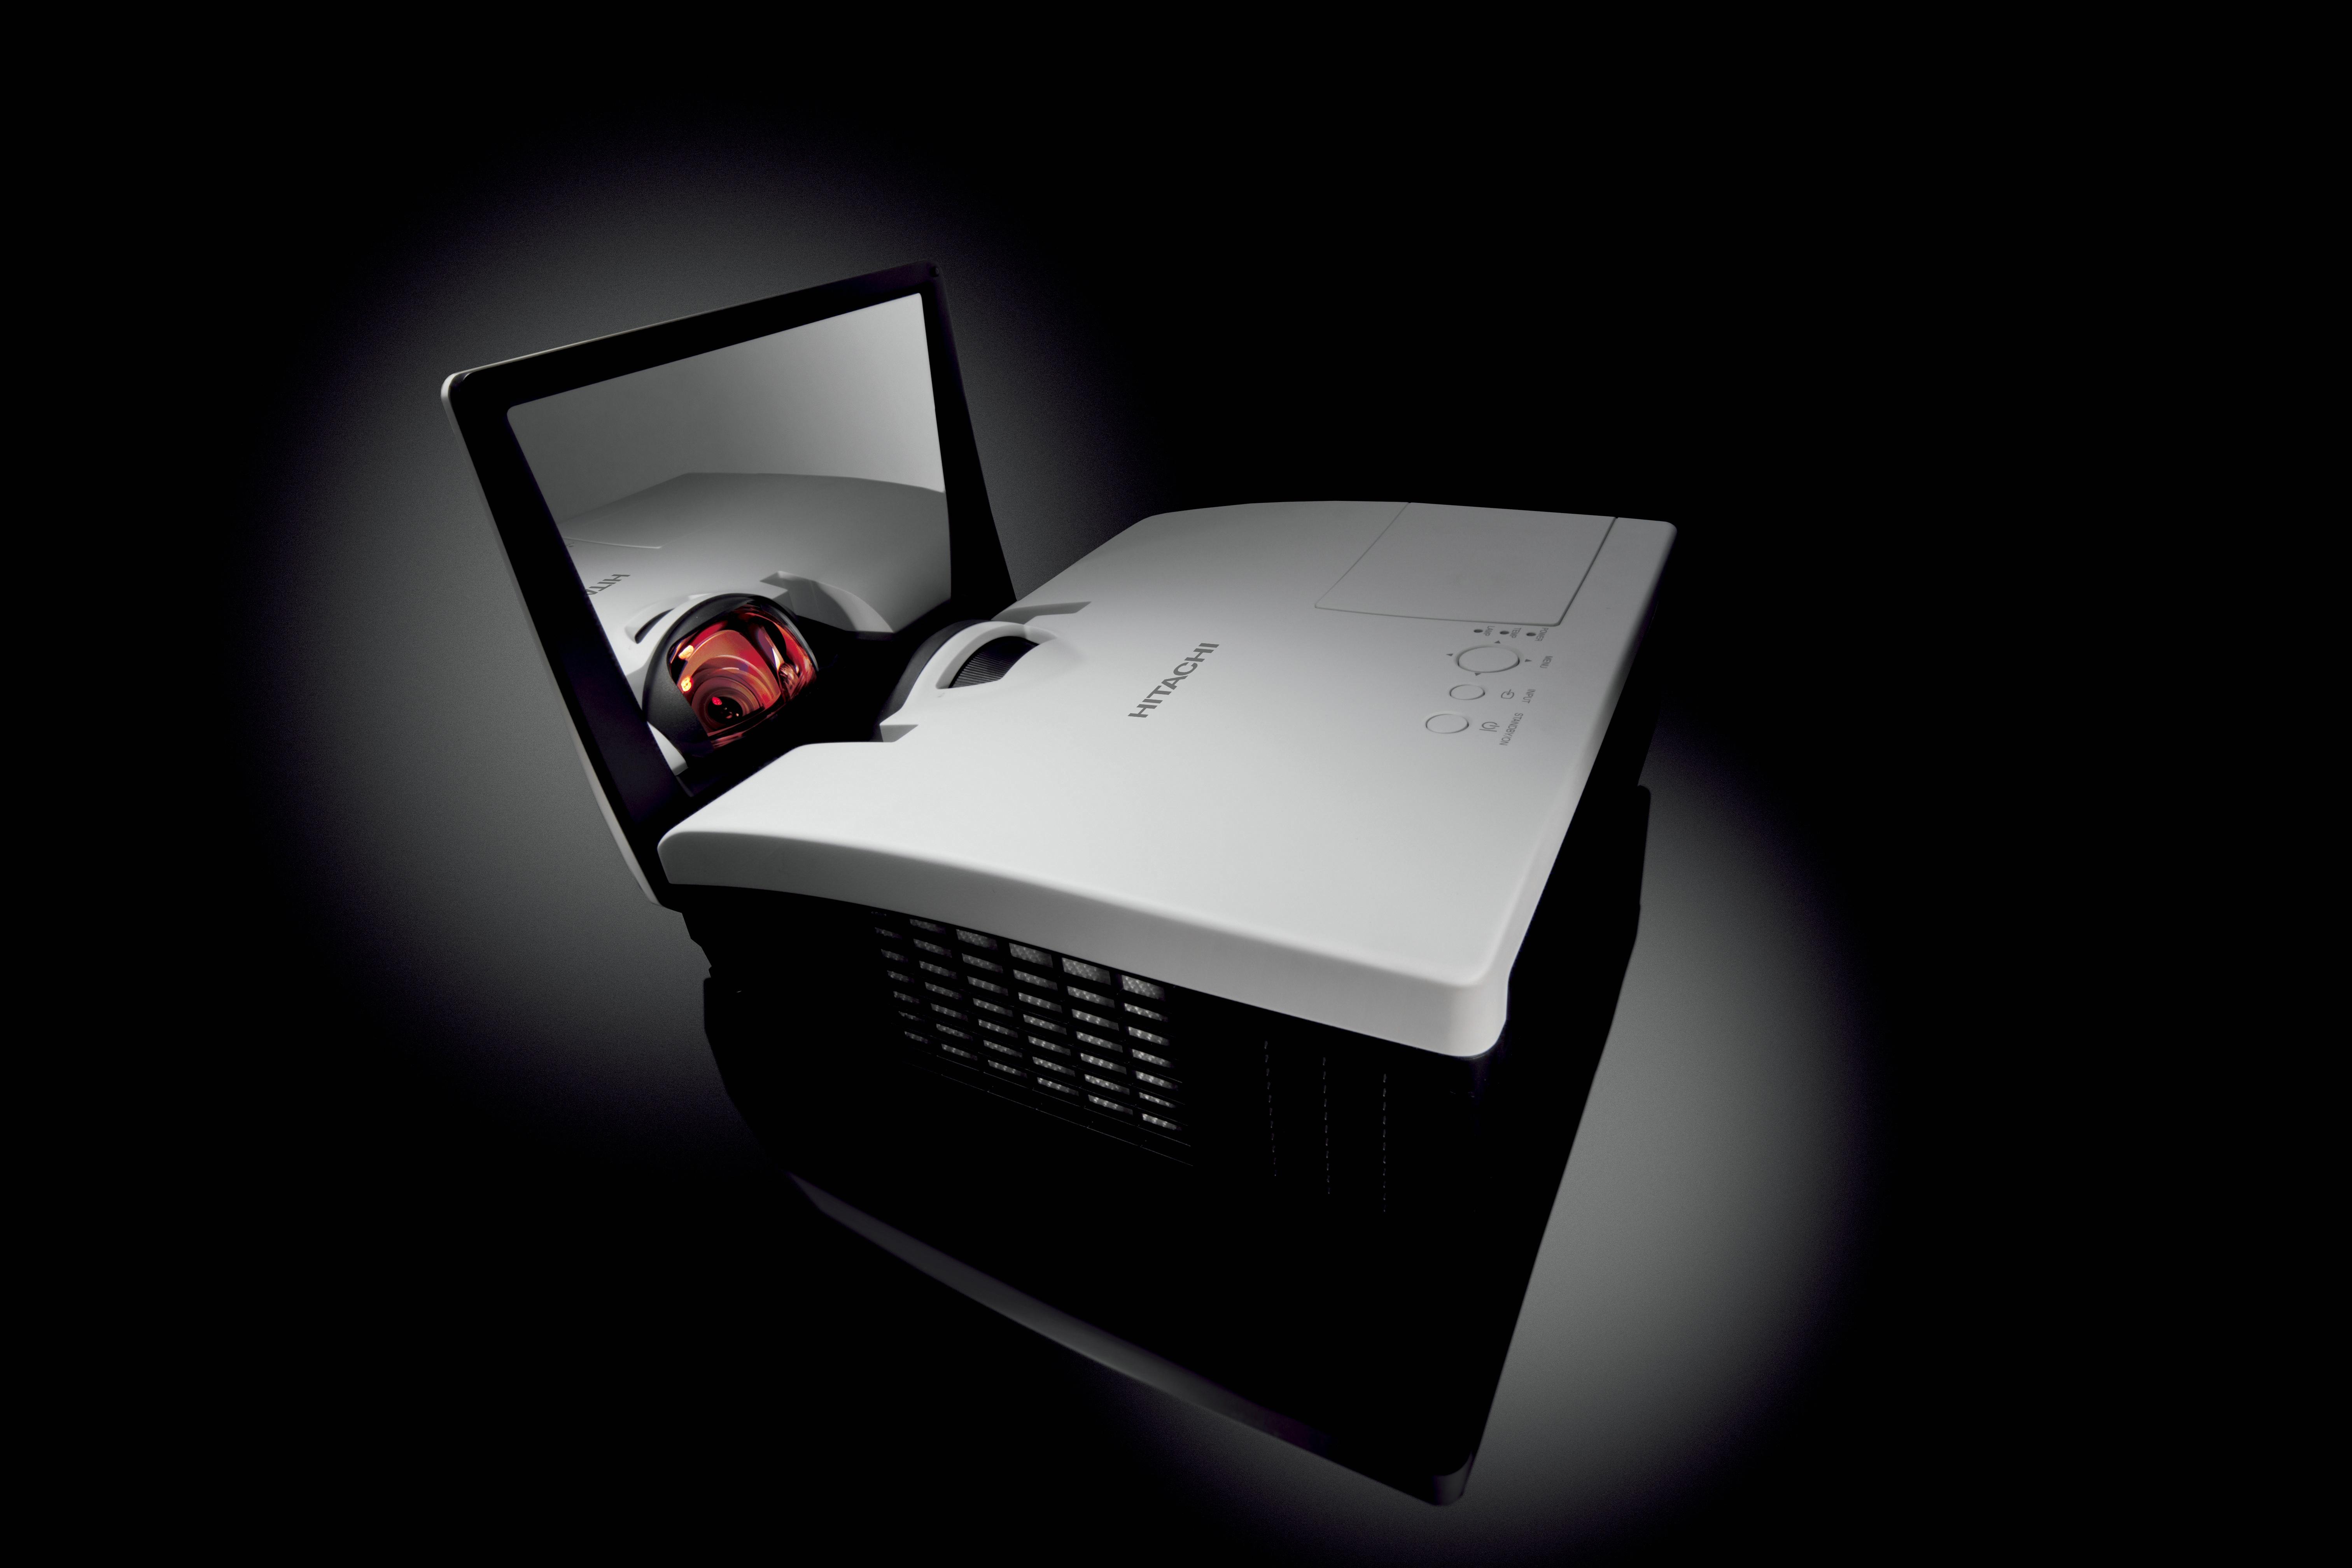 Hitachi Projektoren Cp Aw100n Wxga Lcd Beamer X4041wn Wifi Projector Projektor